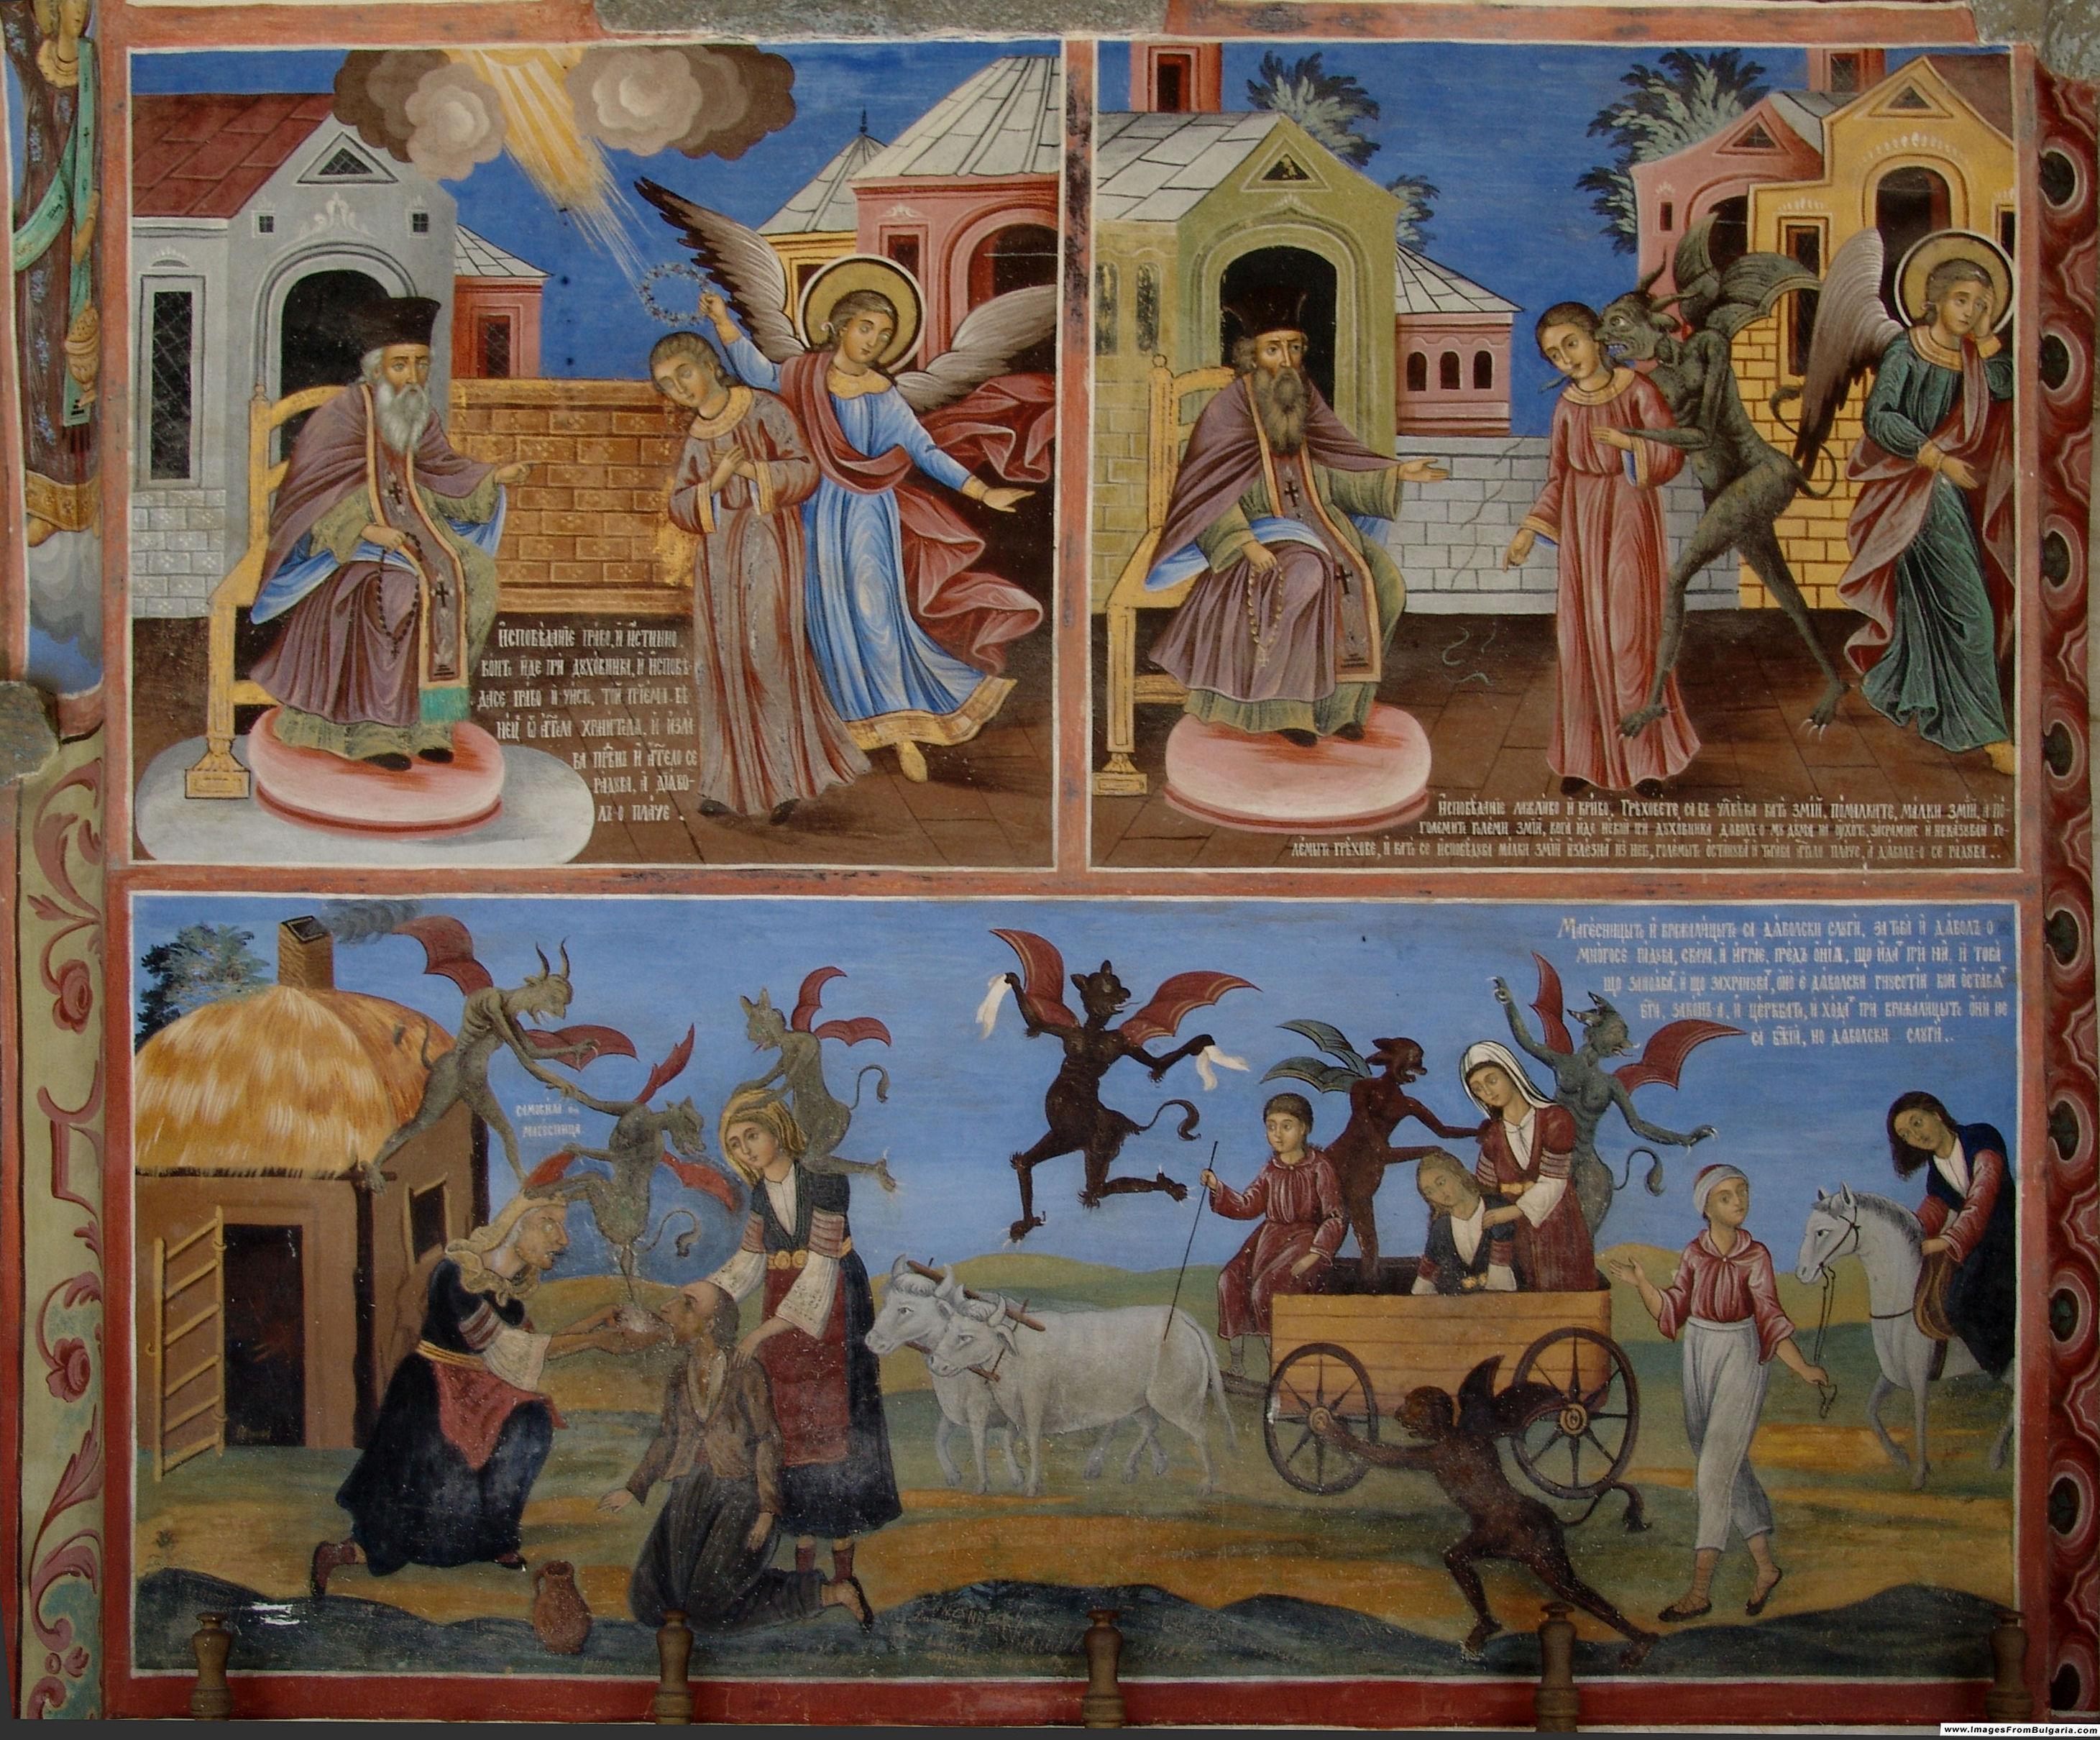 Rila Monastery wall painting - Aleister Crowley & Austin Osman Spare